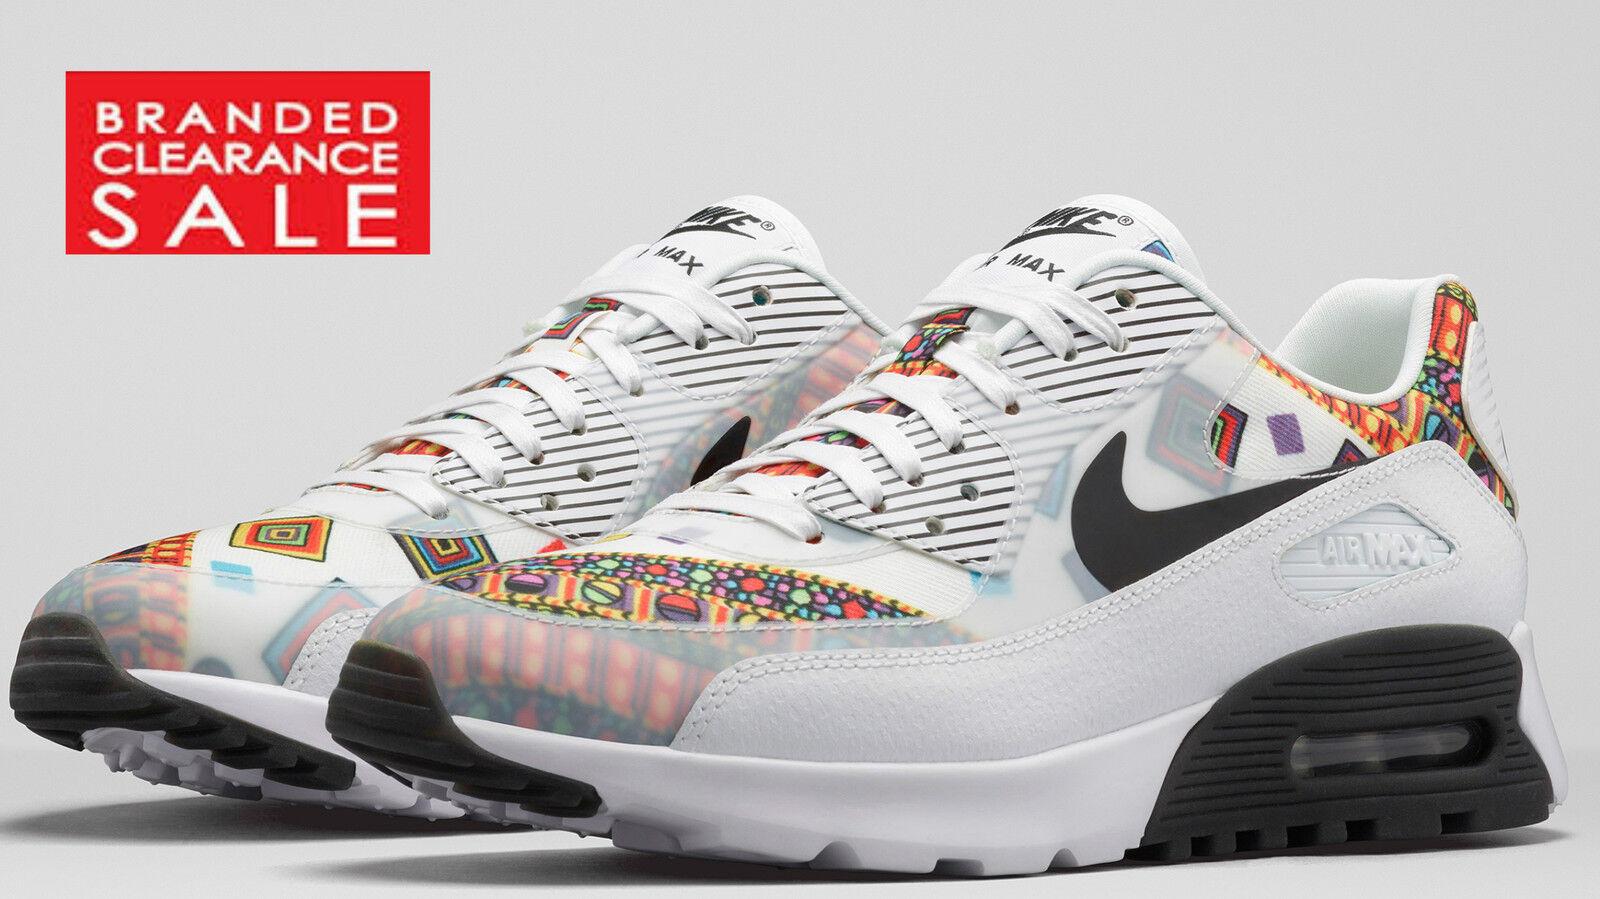 Bnwt Nuovo Donna Bianco Nike Air Max 90 Ultra Liberty 6 QS Taglia 5 e 6 Liberty 99dde5